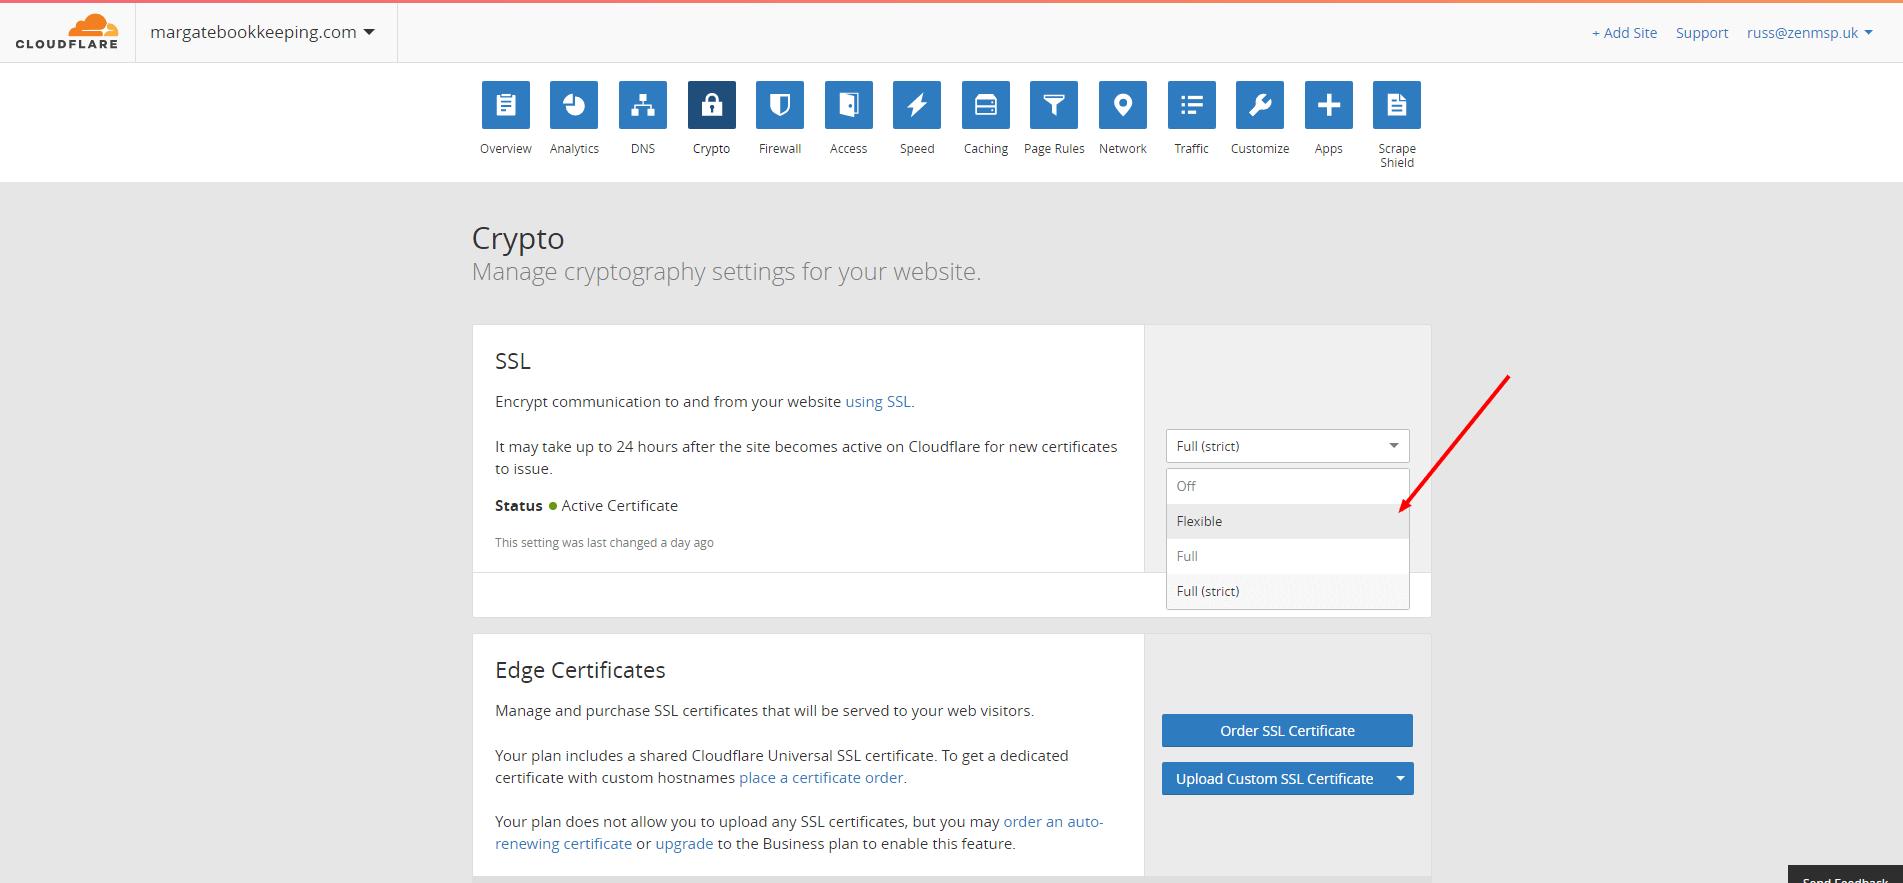 Wordpress ERR_TOO_MANY_REDIRECTS 4 WordPress